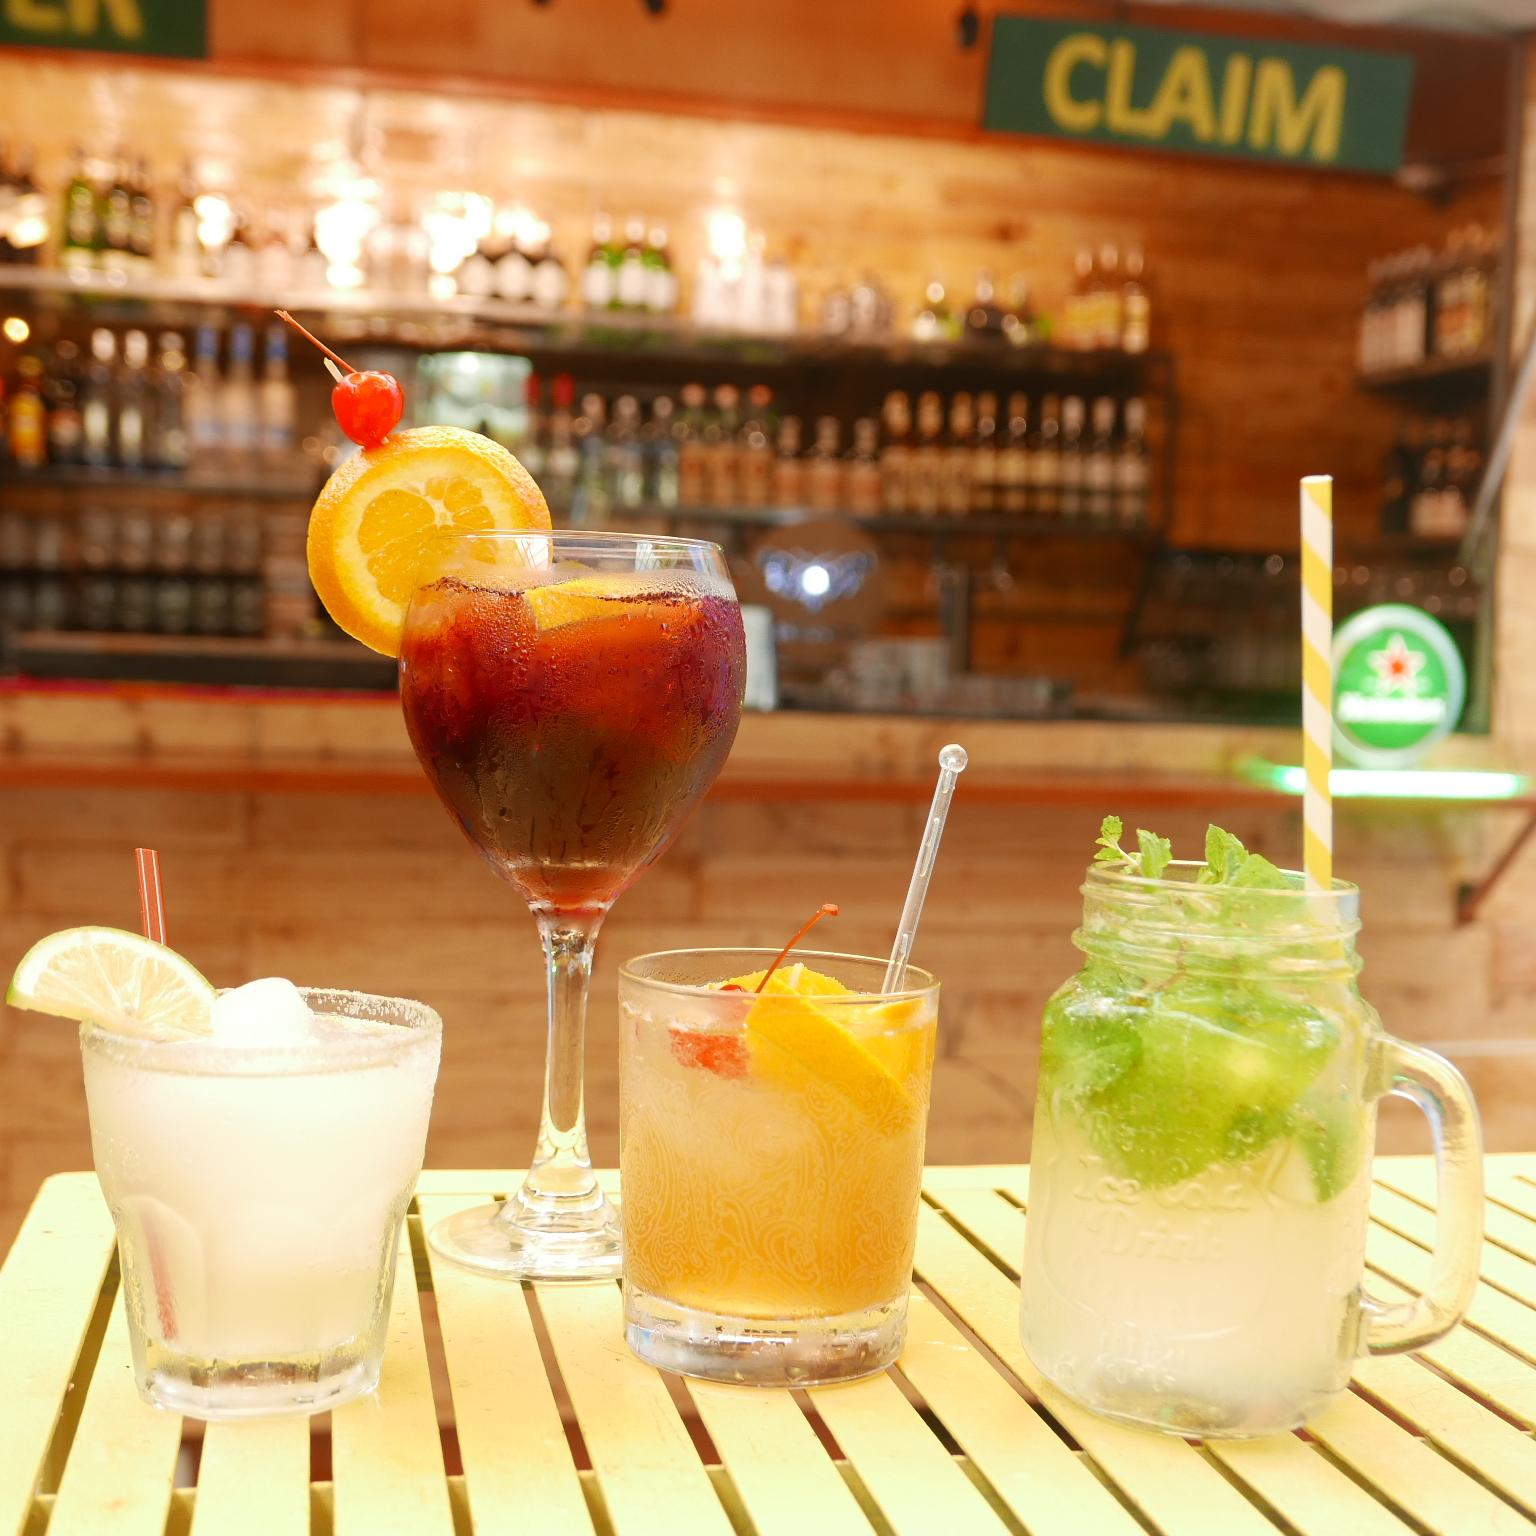 restaurants in makati, restaurants in poblacion, bars in makati, late night bars, alcoholic beverages, cocktails, cocktail recipes, best bars in poblacion, buy 1 get 1 deals, top deals